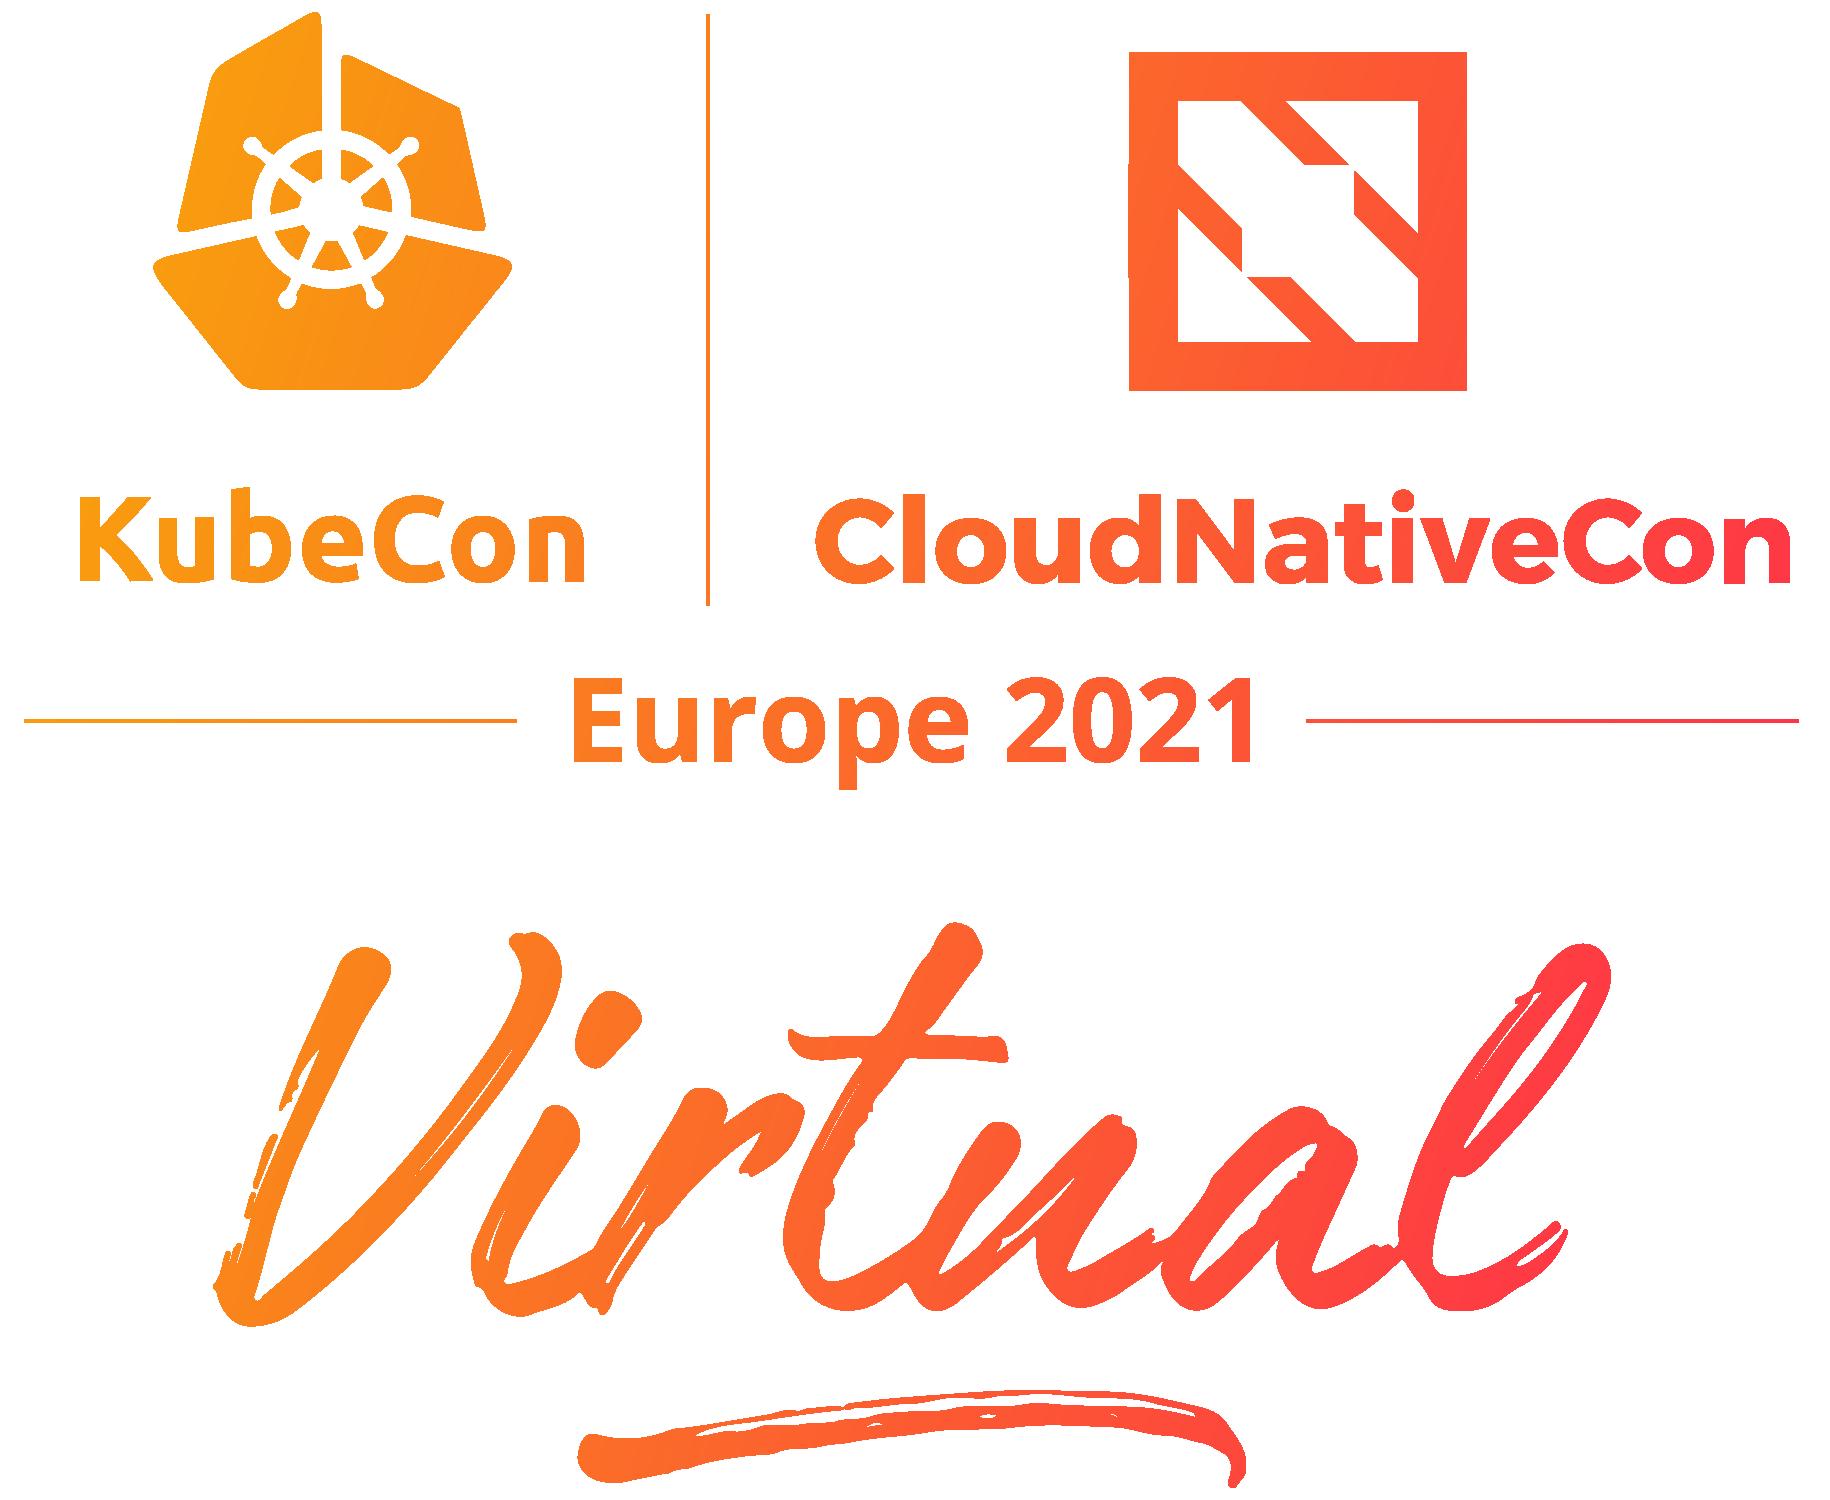 kubecon-logo